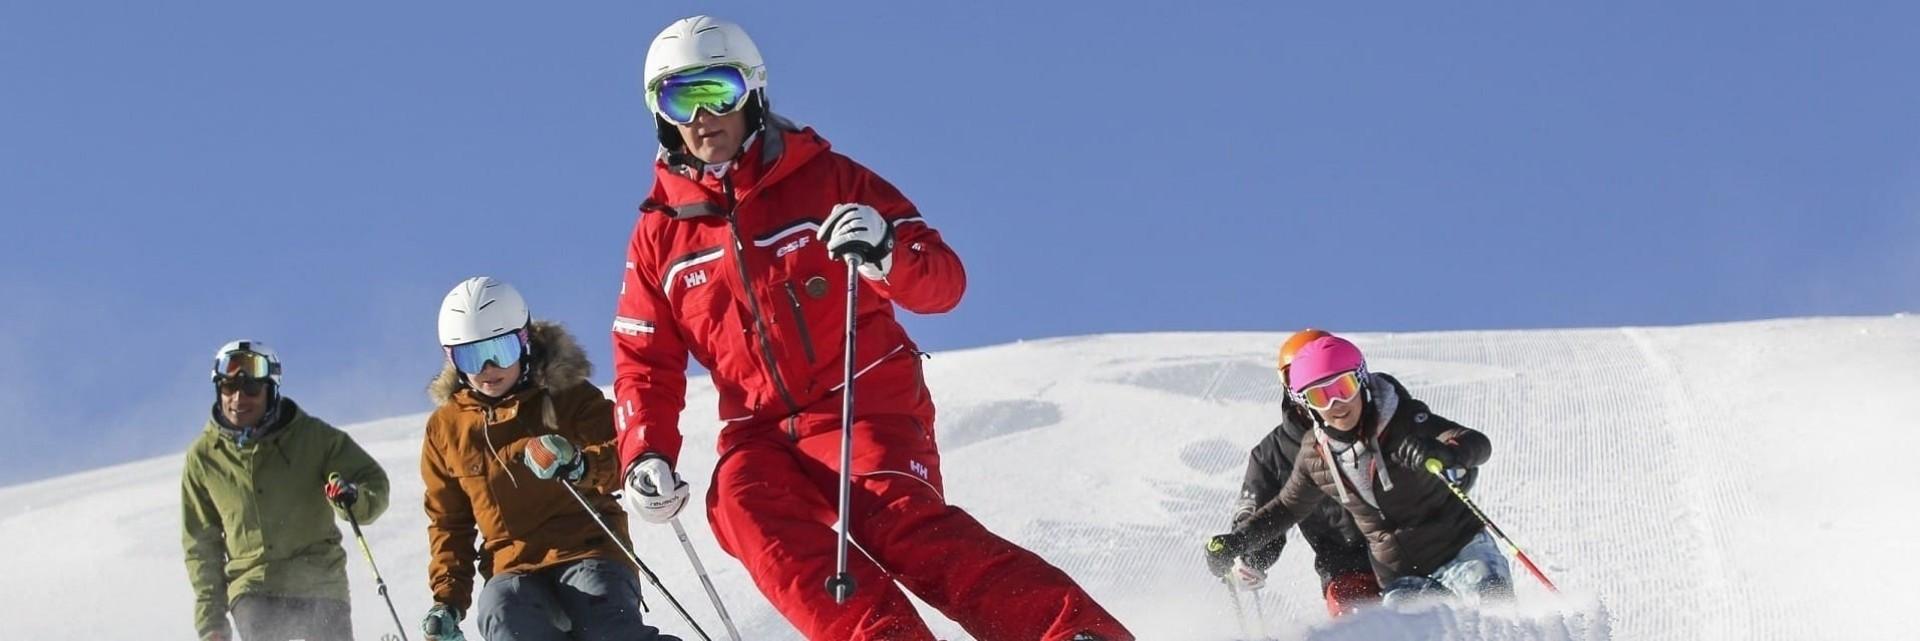 Adult ski lesson with ESF Châtel ski instructor